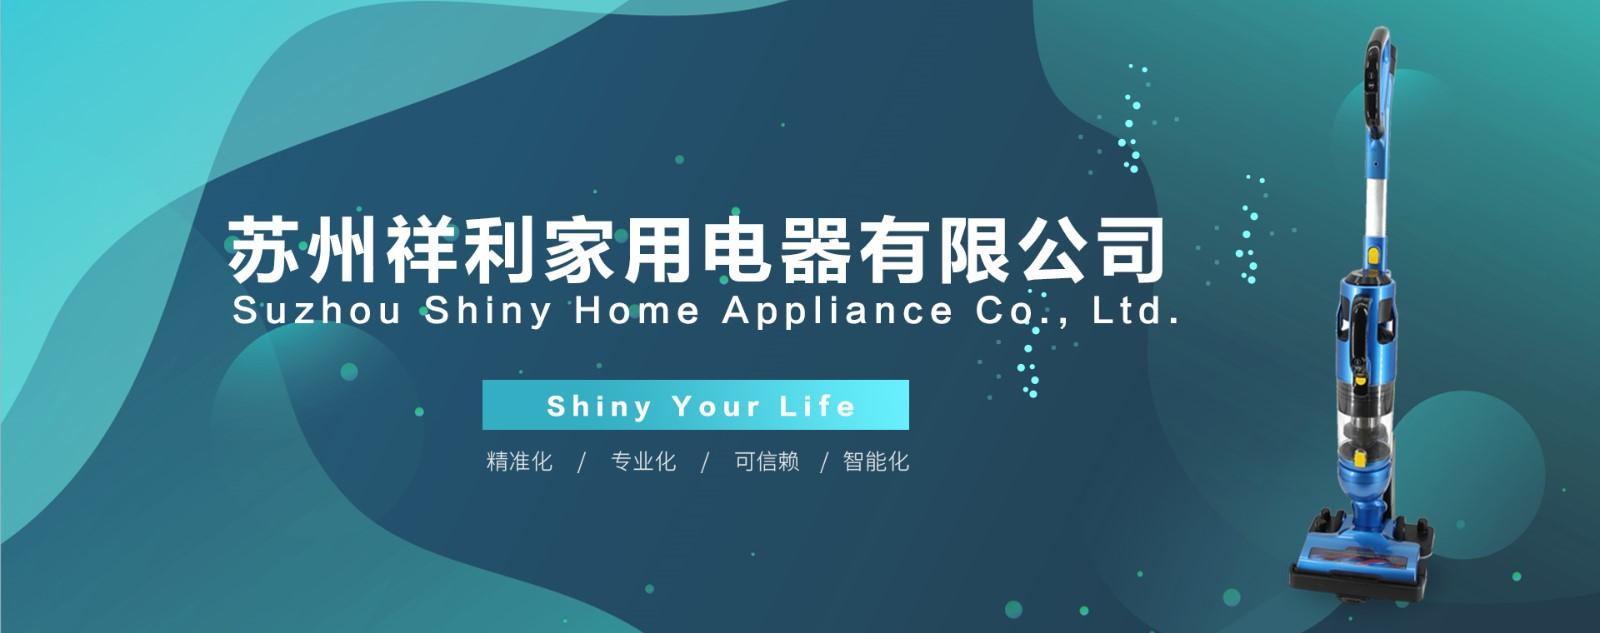 Suzhou Shiny Home Appliance Co., Ltd